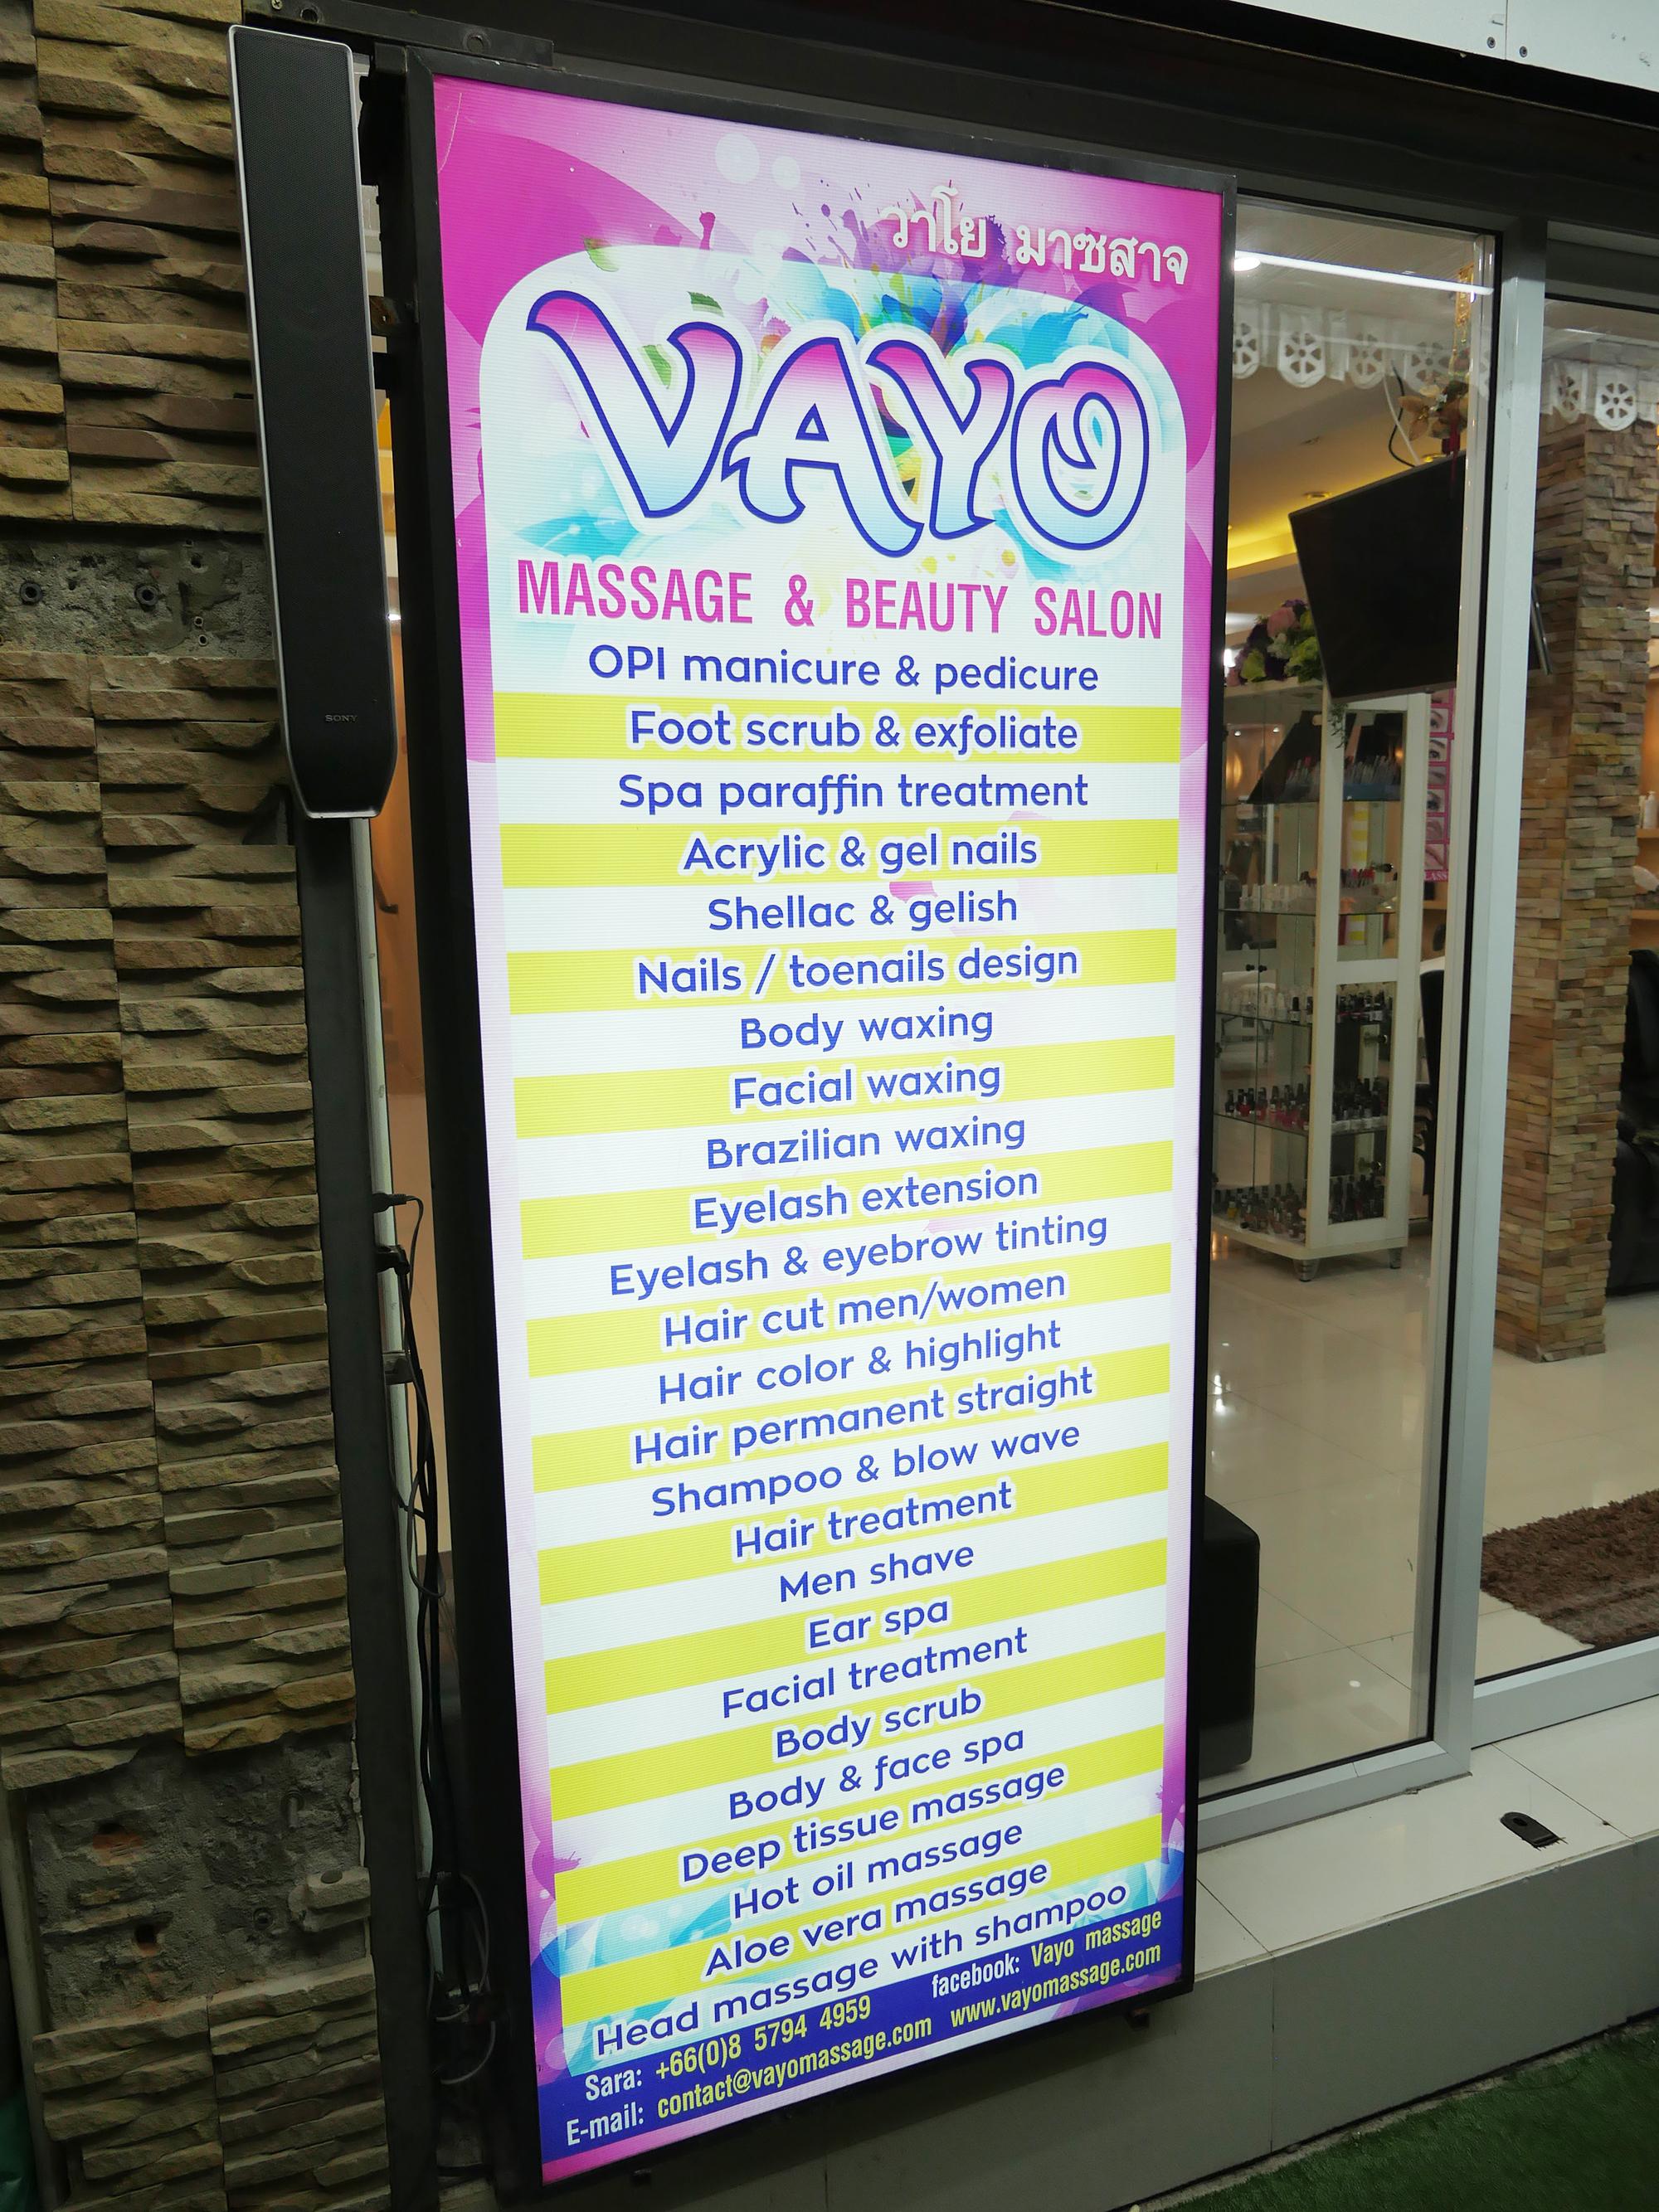 VAYO-MASSAGE-BIG-MENU